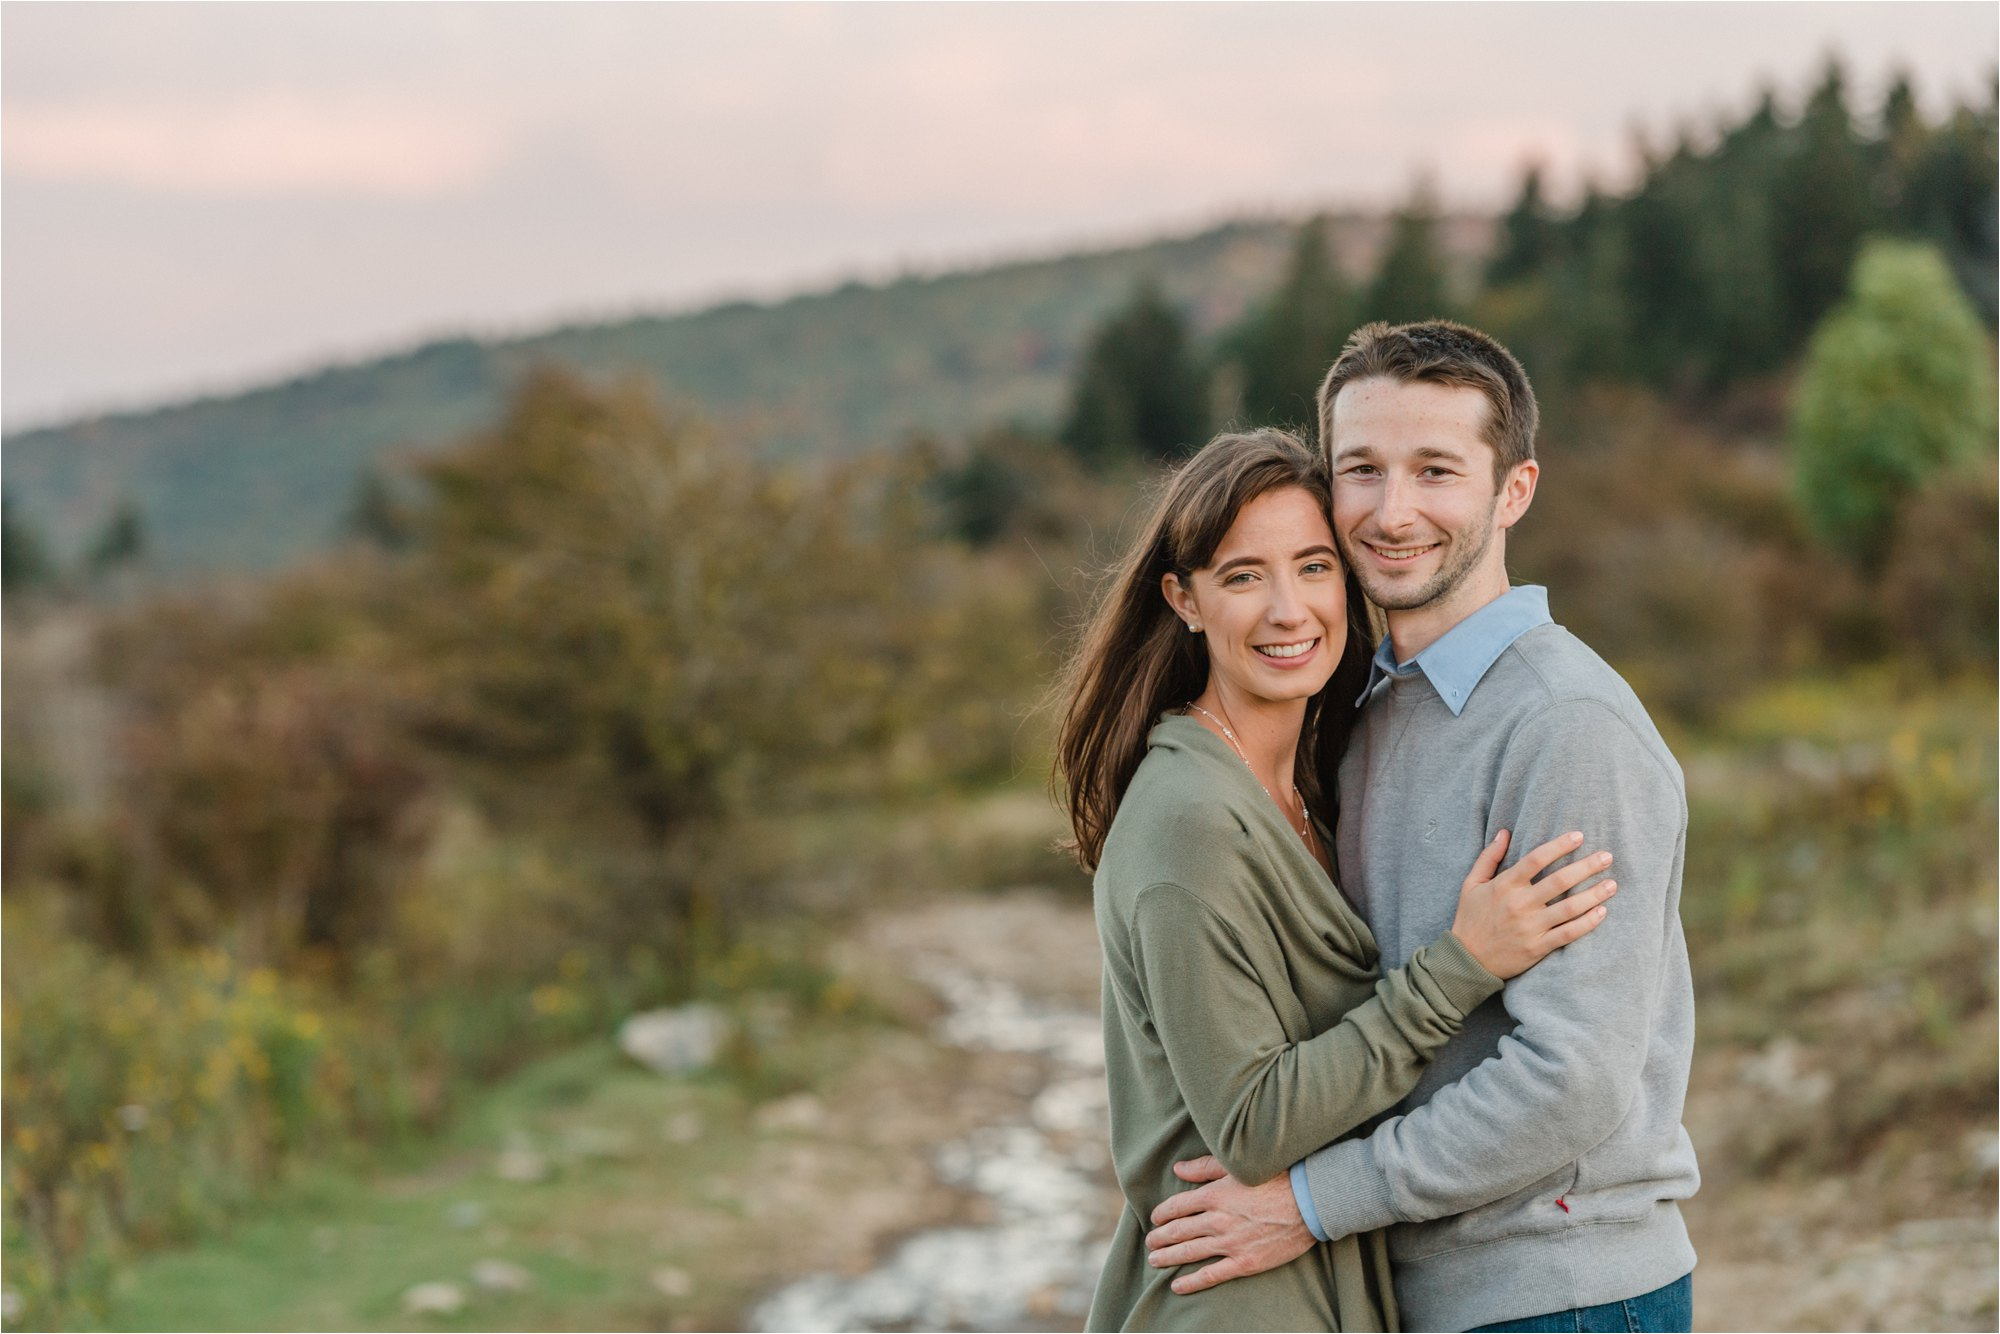 Engaged Couple Posing at Blue Ridge Mountains